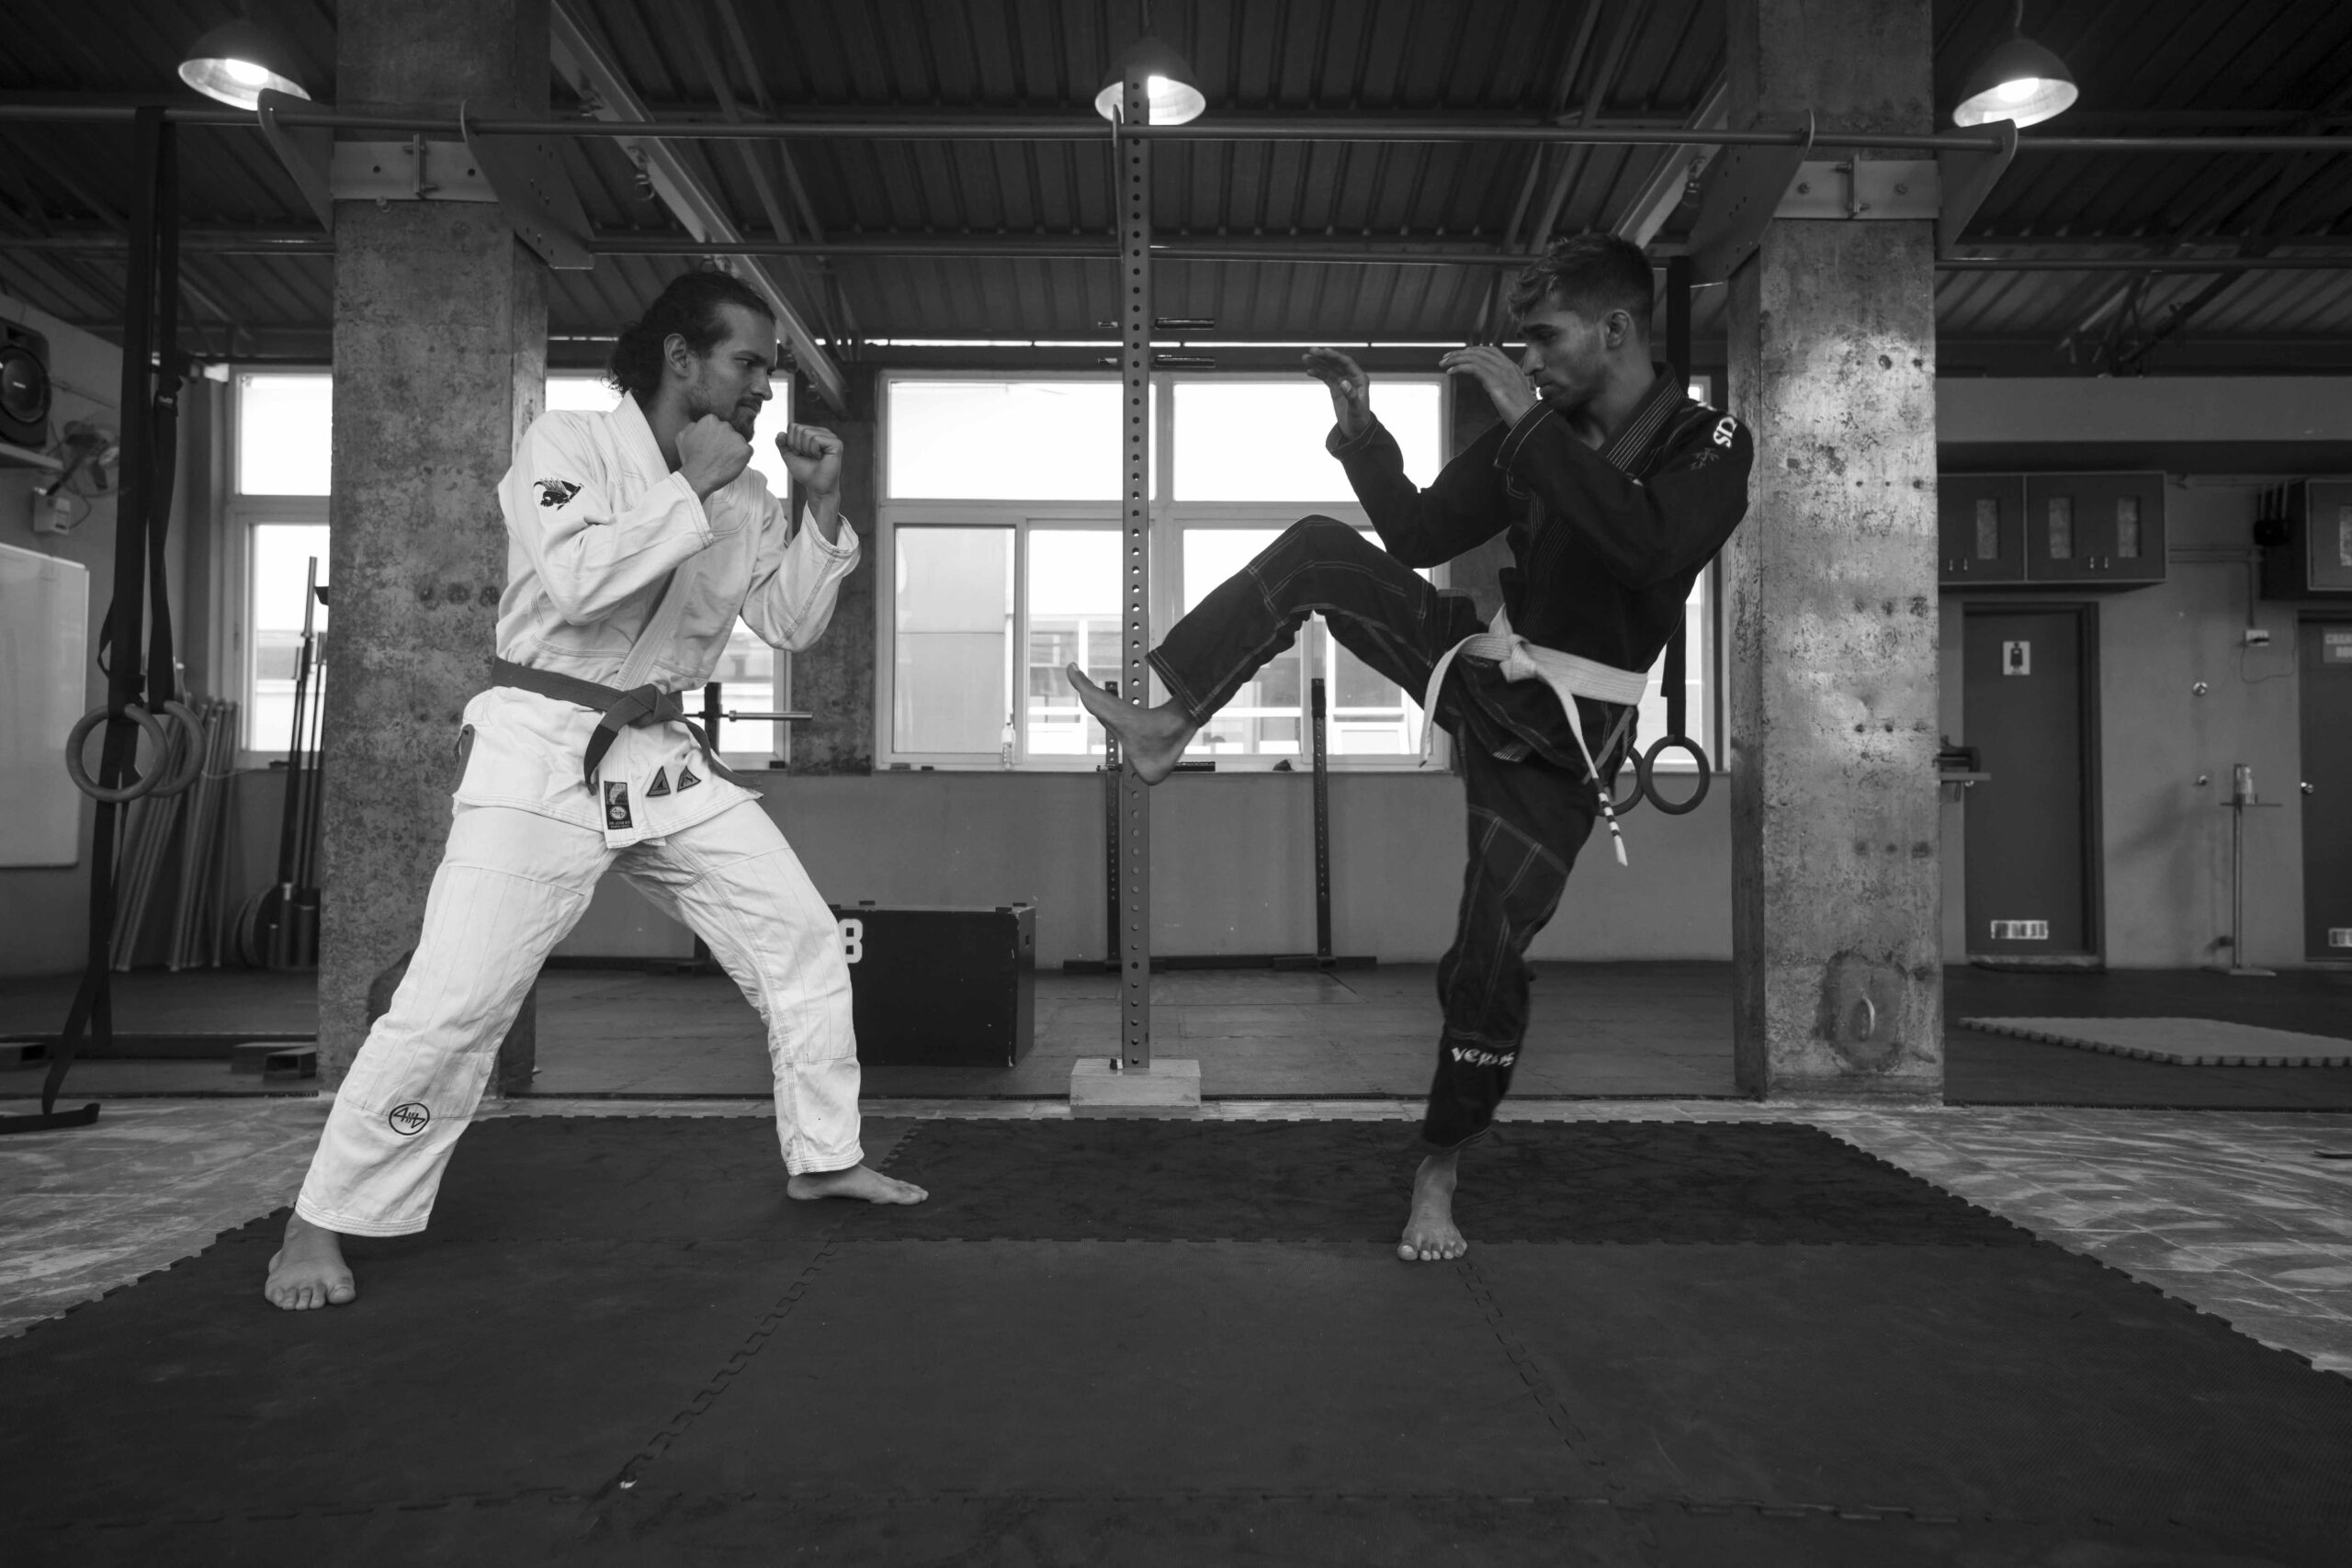 Self Defense - a life skill